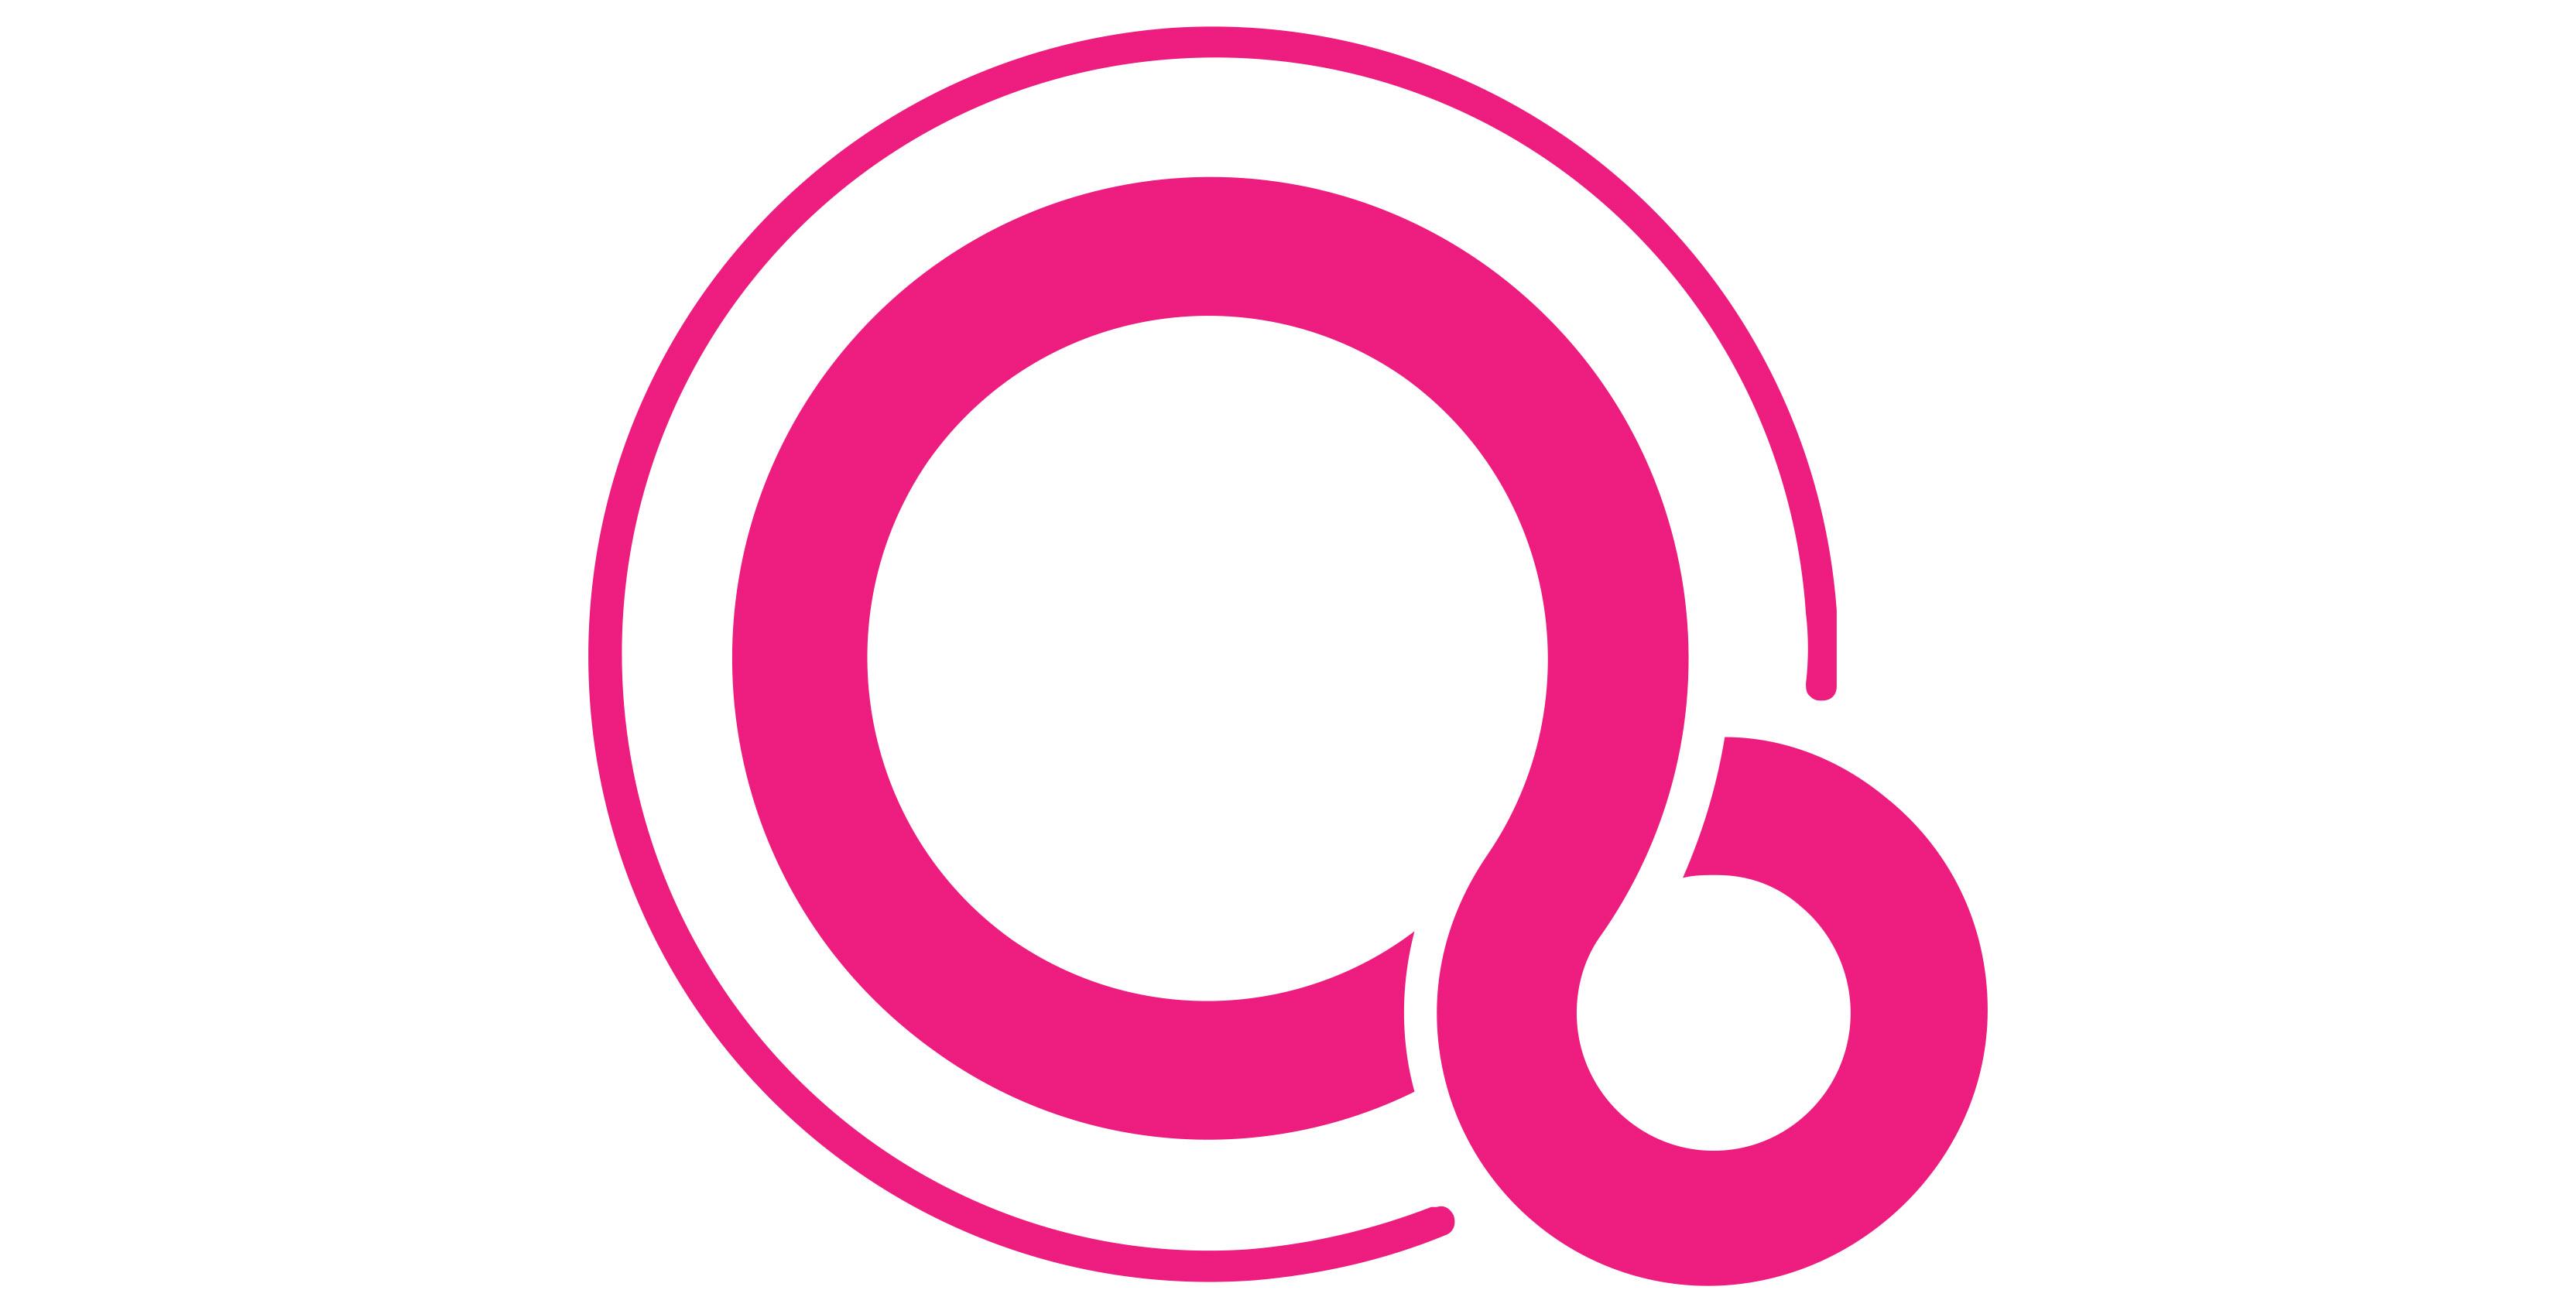 Fuchsia logo